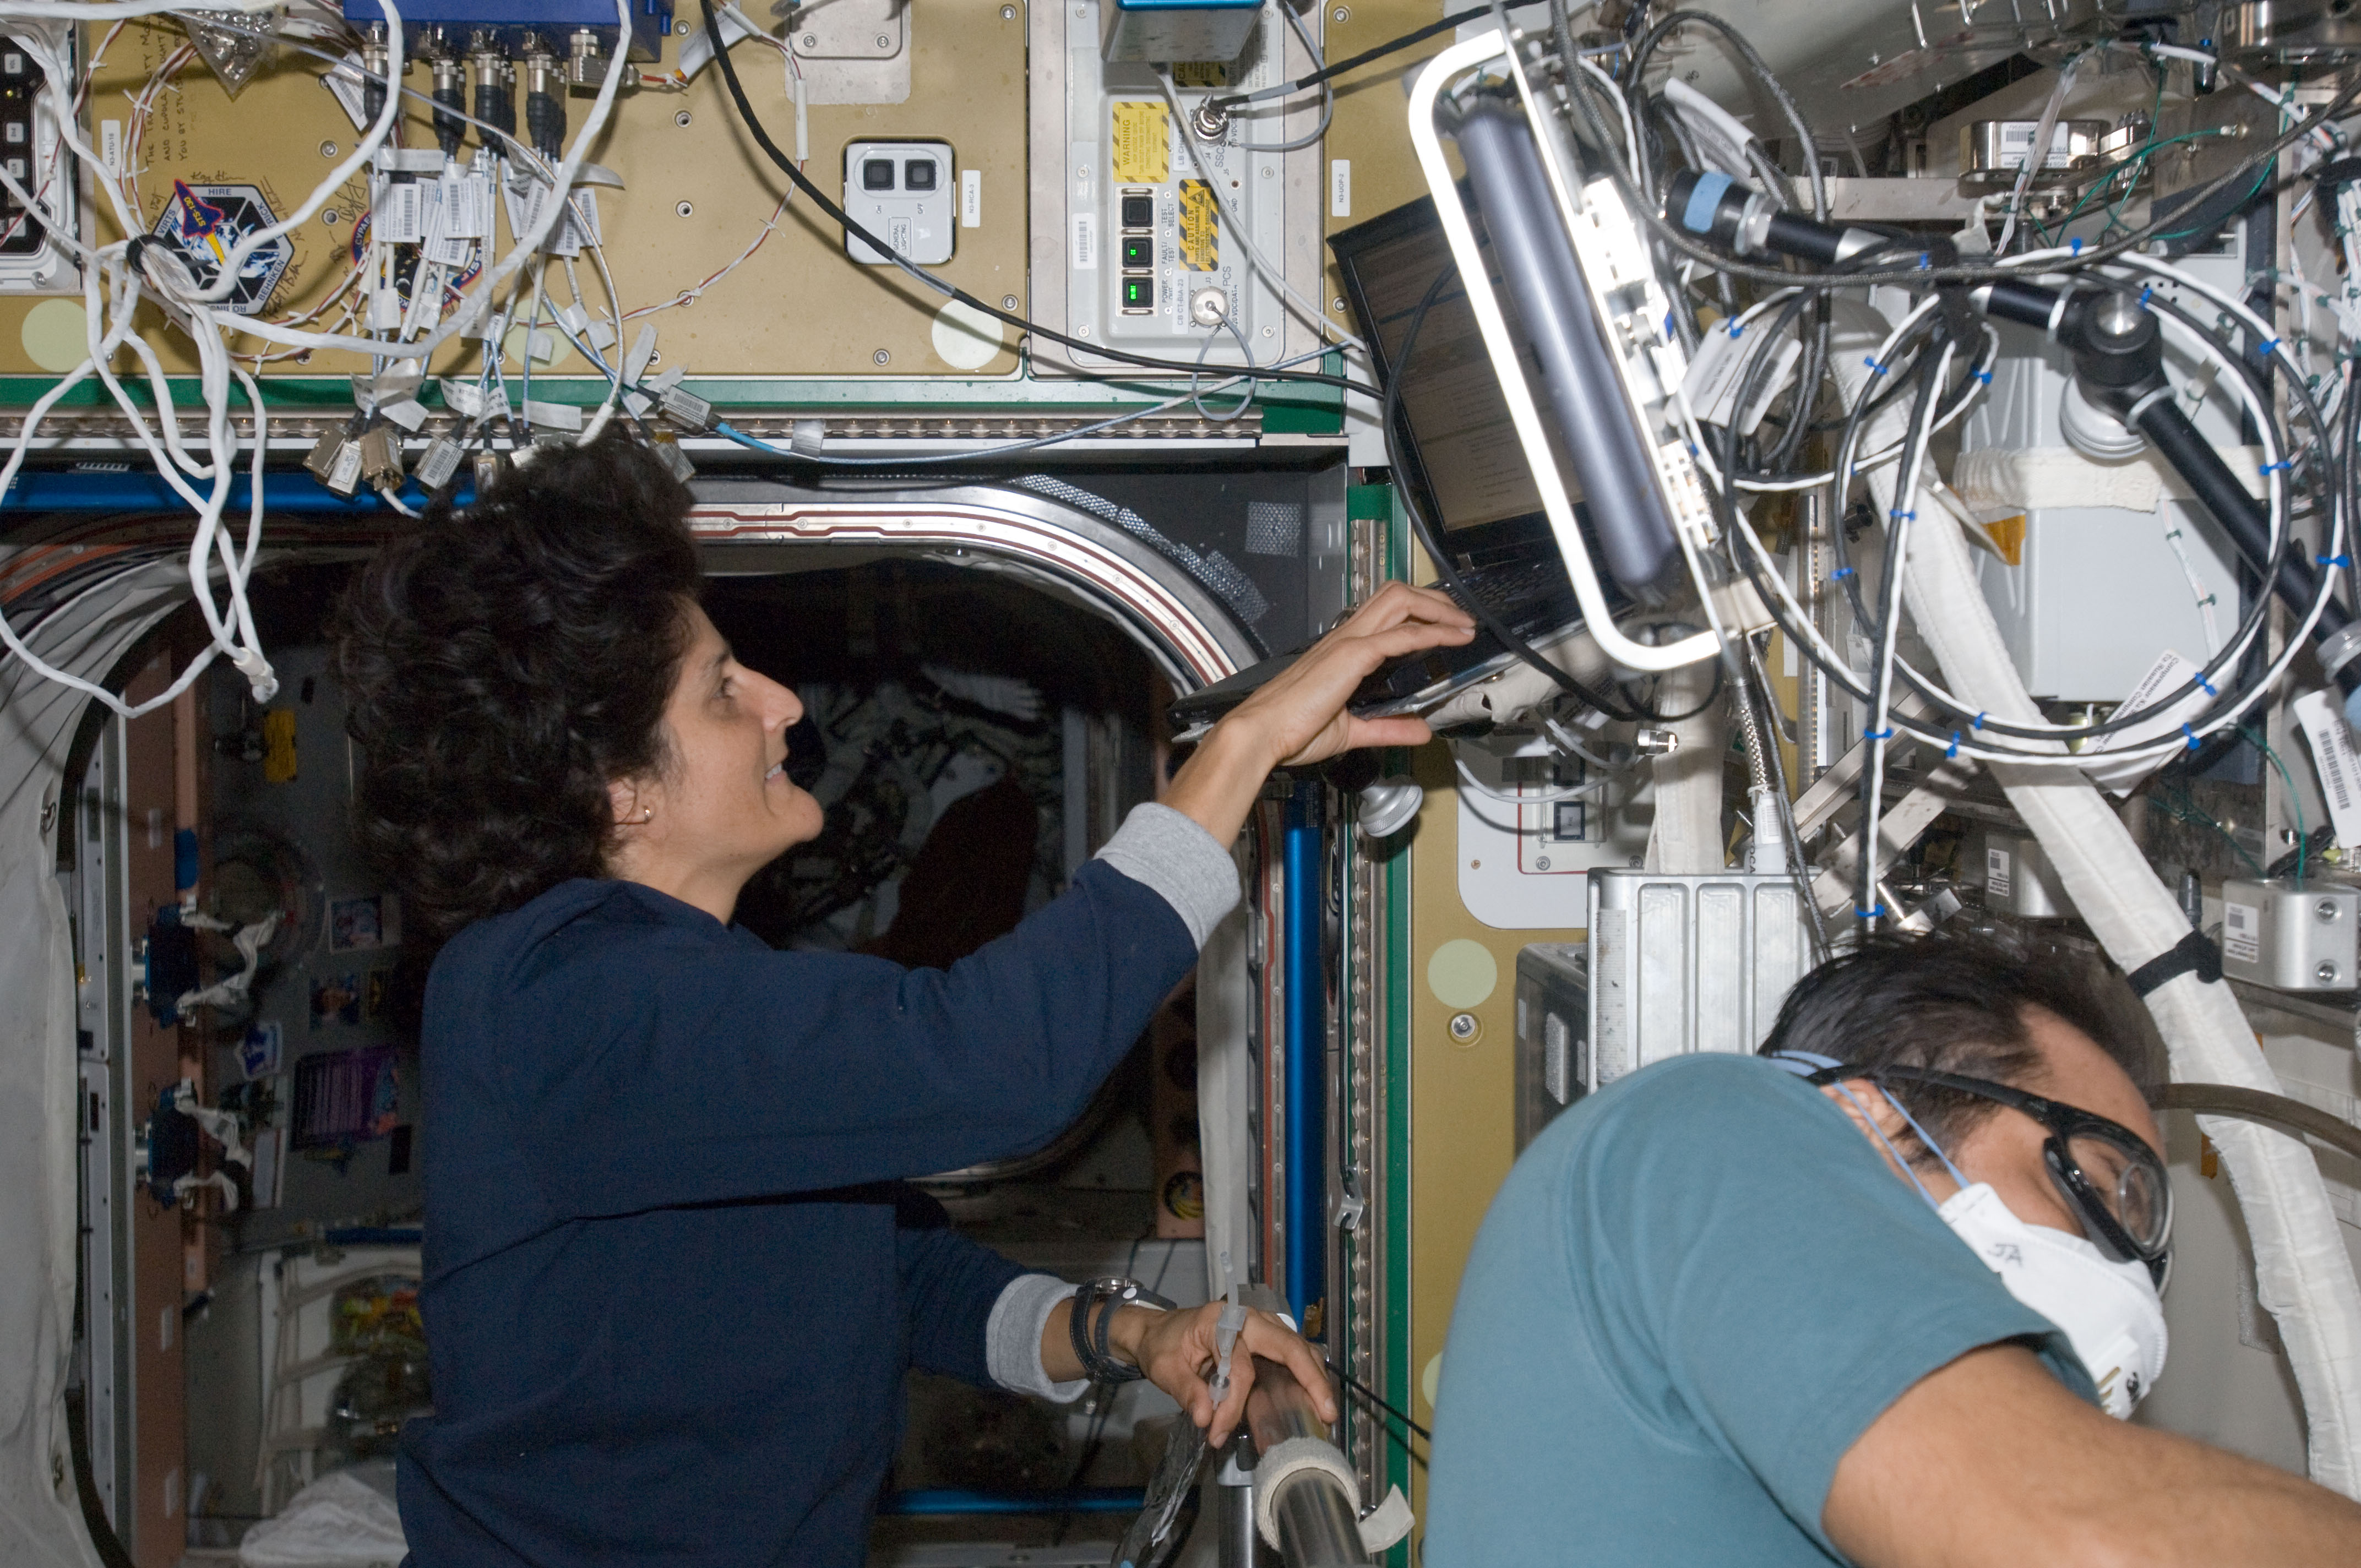 NASA - Sunita Williams and Joe Acaba